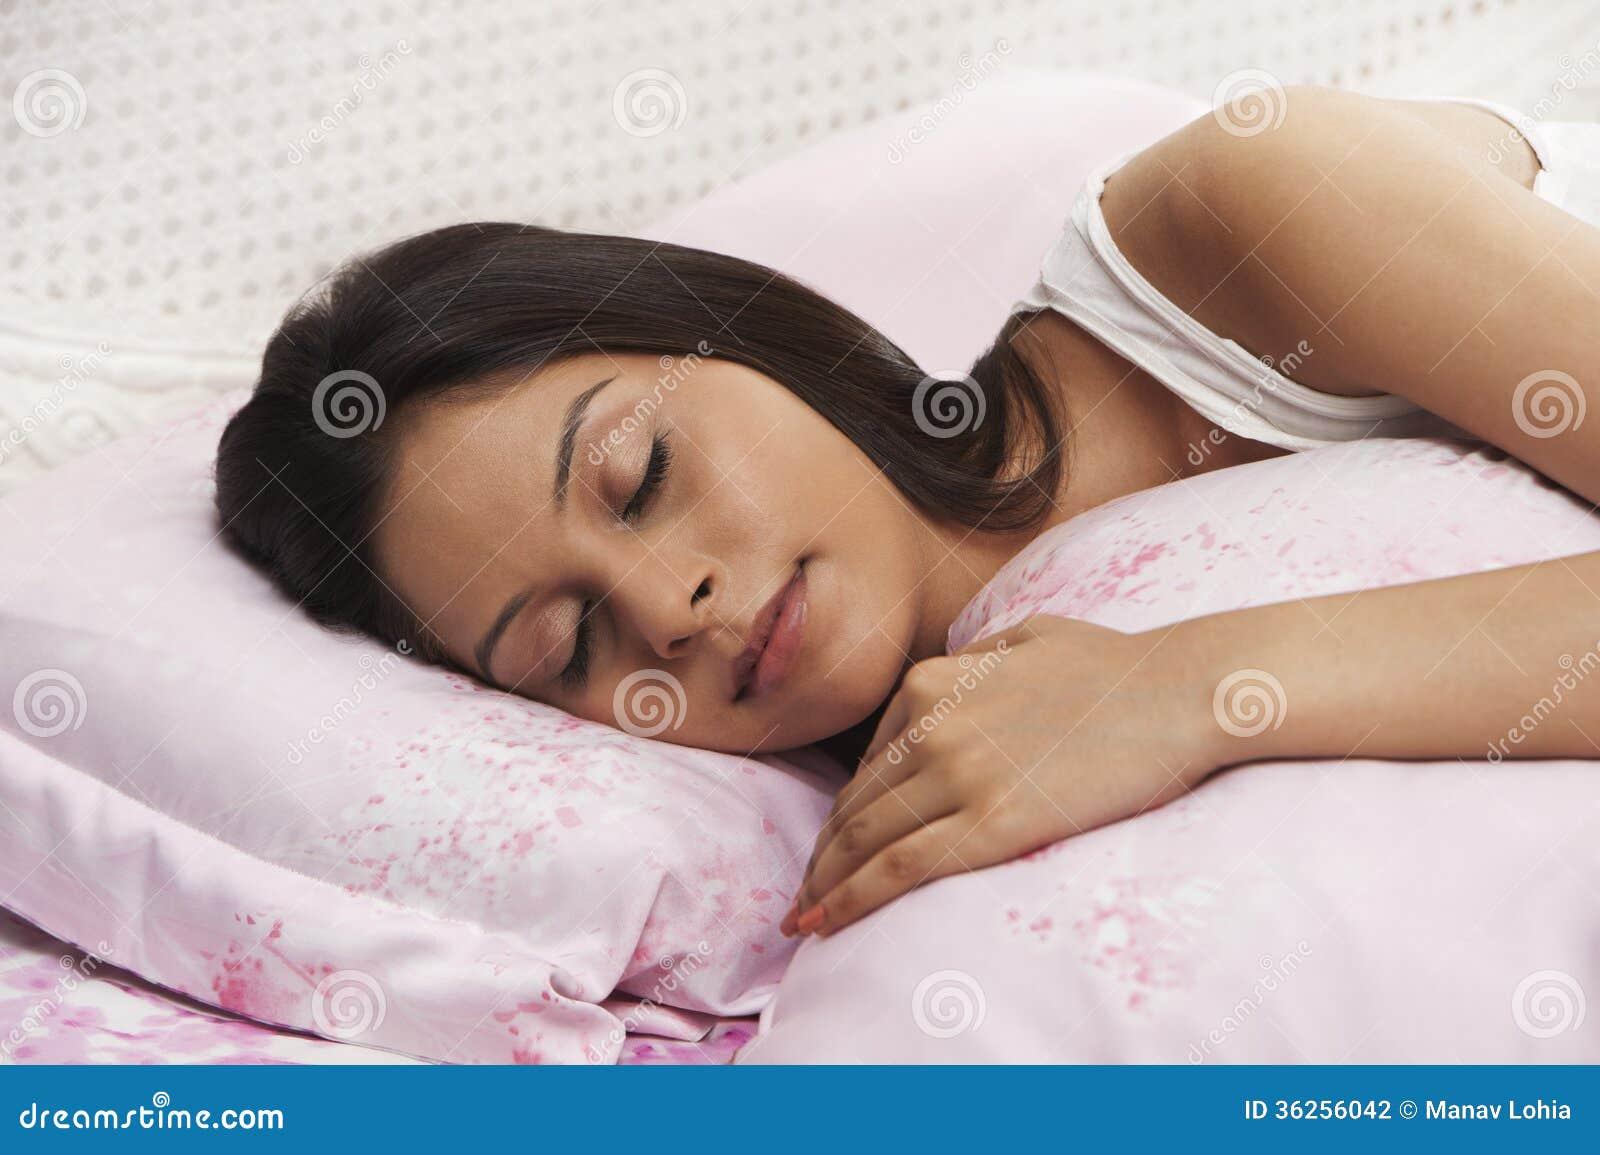 Трахал тетку а она спала, Трахнул спящую тетю -видео. Смотреть Трахнул 23 фотография